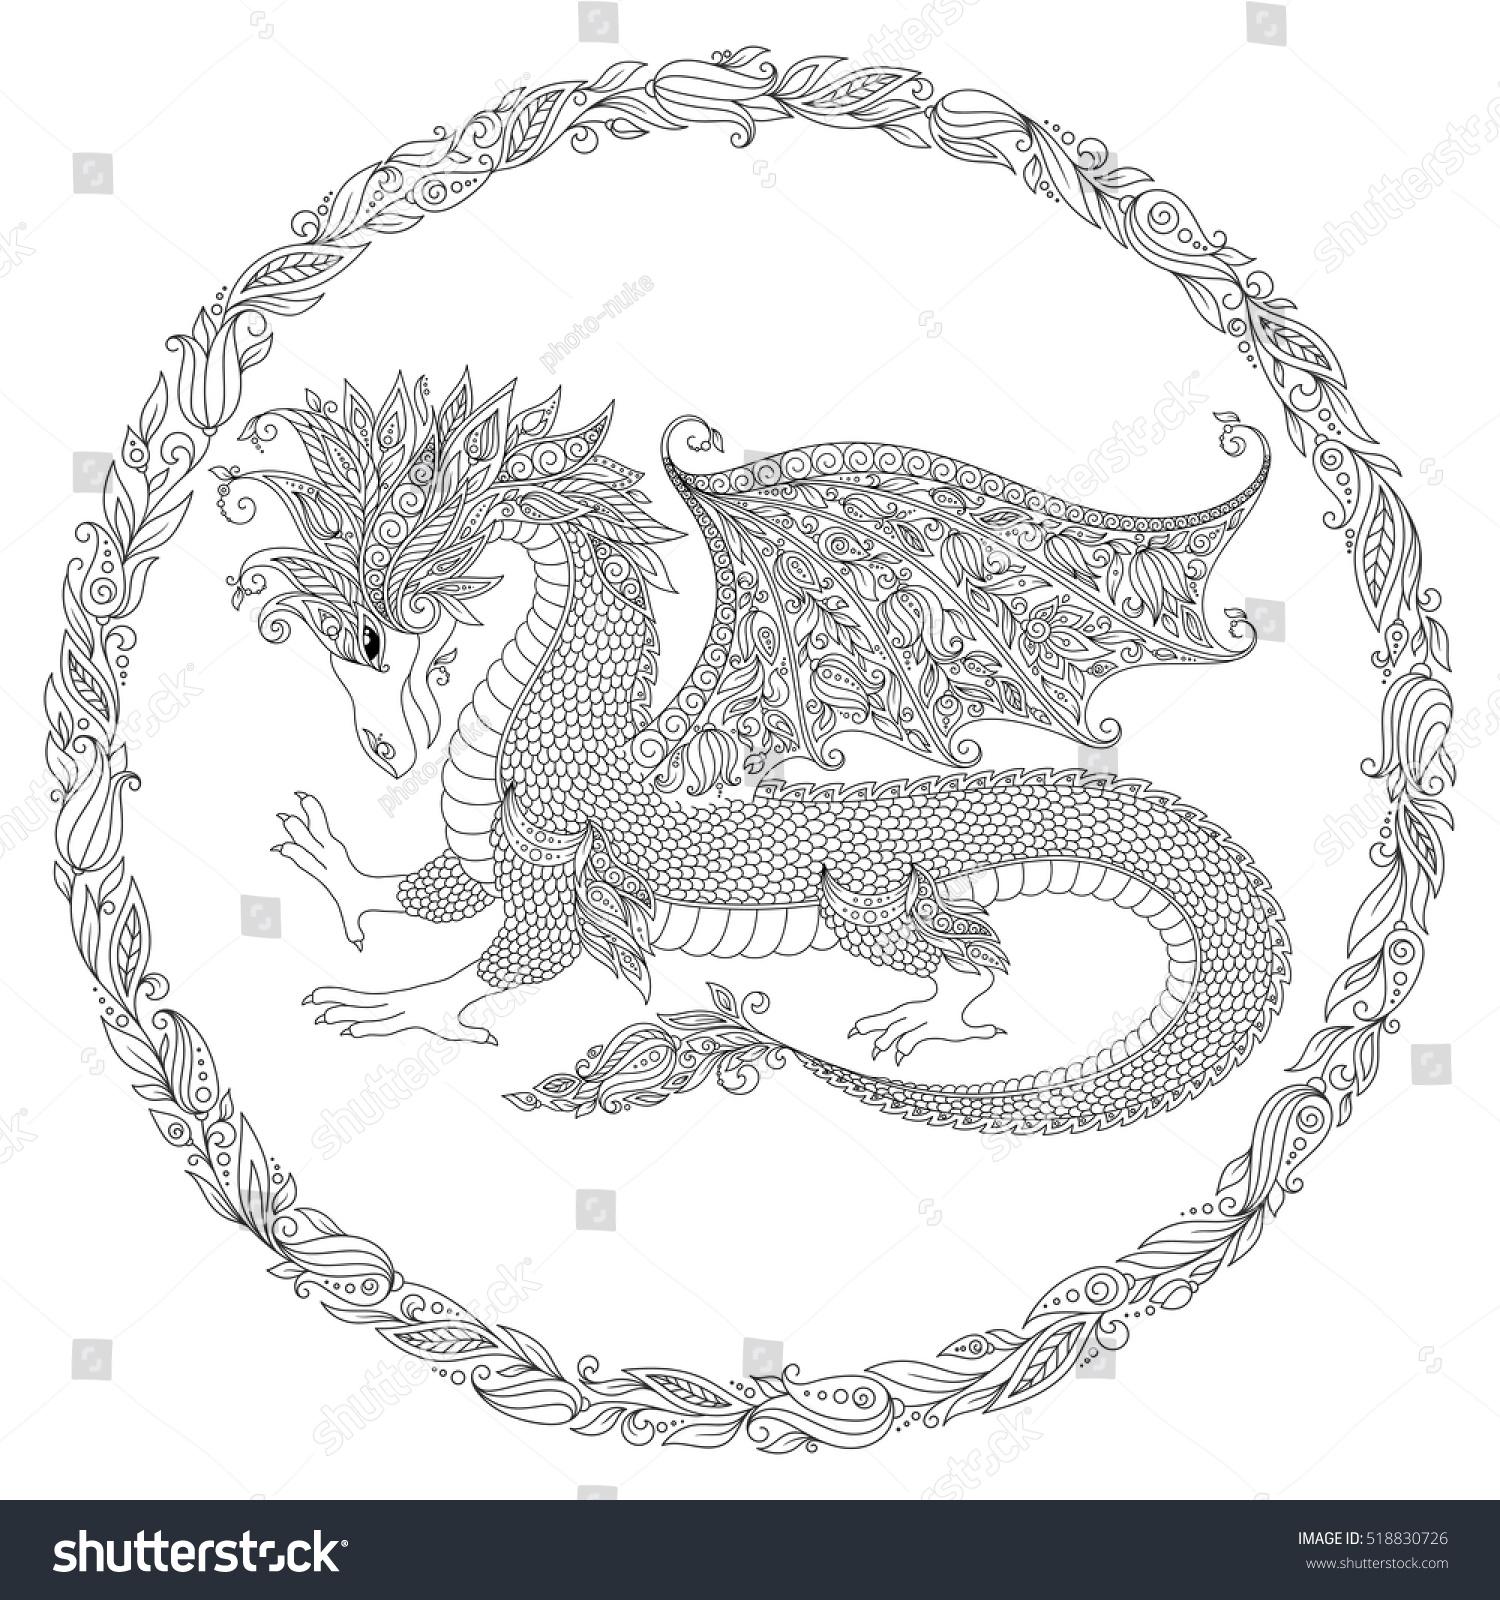 Vector Cartoon Dragon Hand Drawn Black White Doodle Sketch Zen Tangle